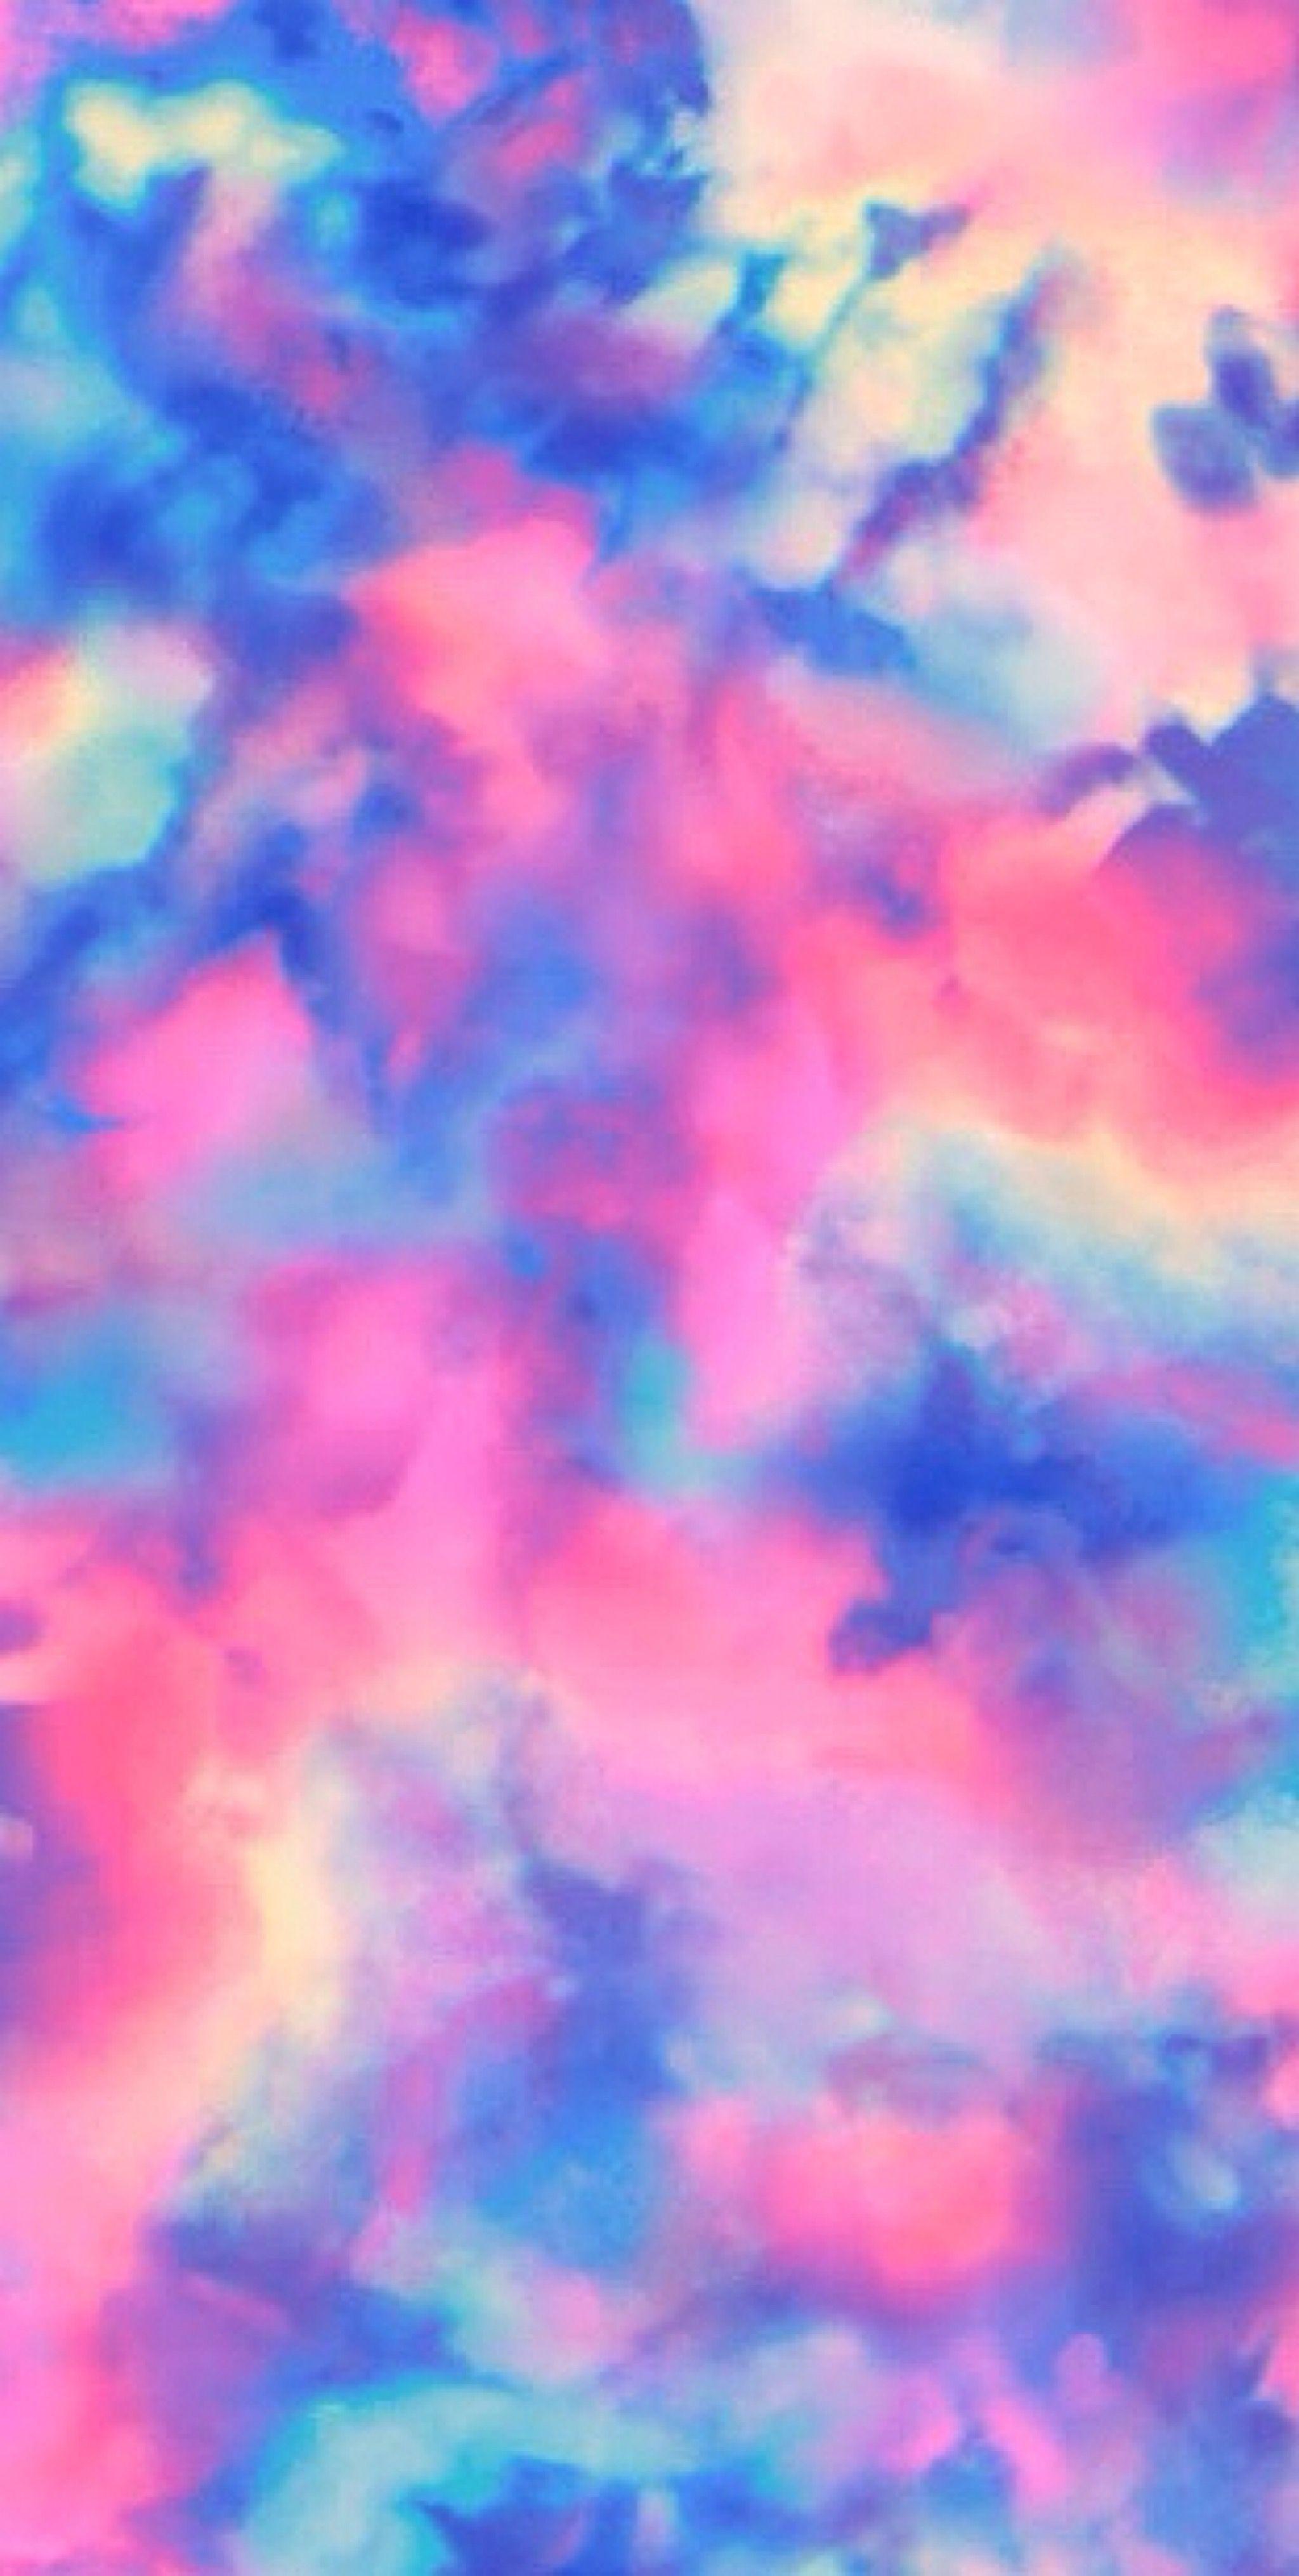 Youtube Ombre Wallpaper Iphone Tie Dye Wallpaper Pink Nation Wallpaper